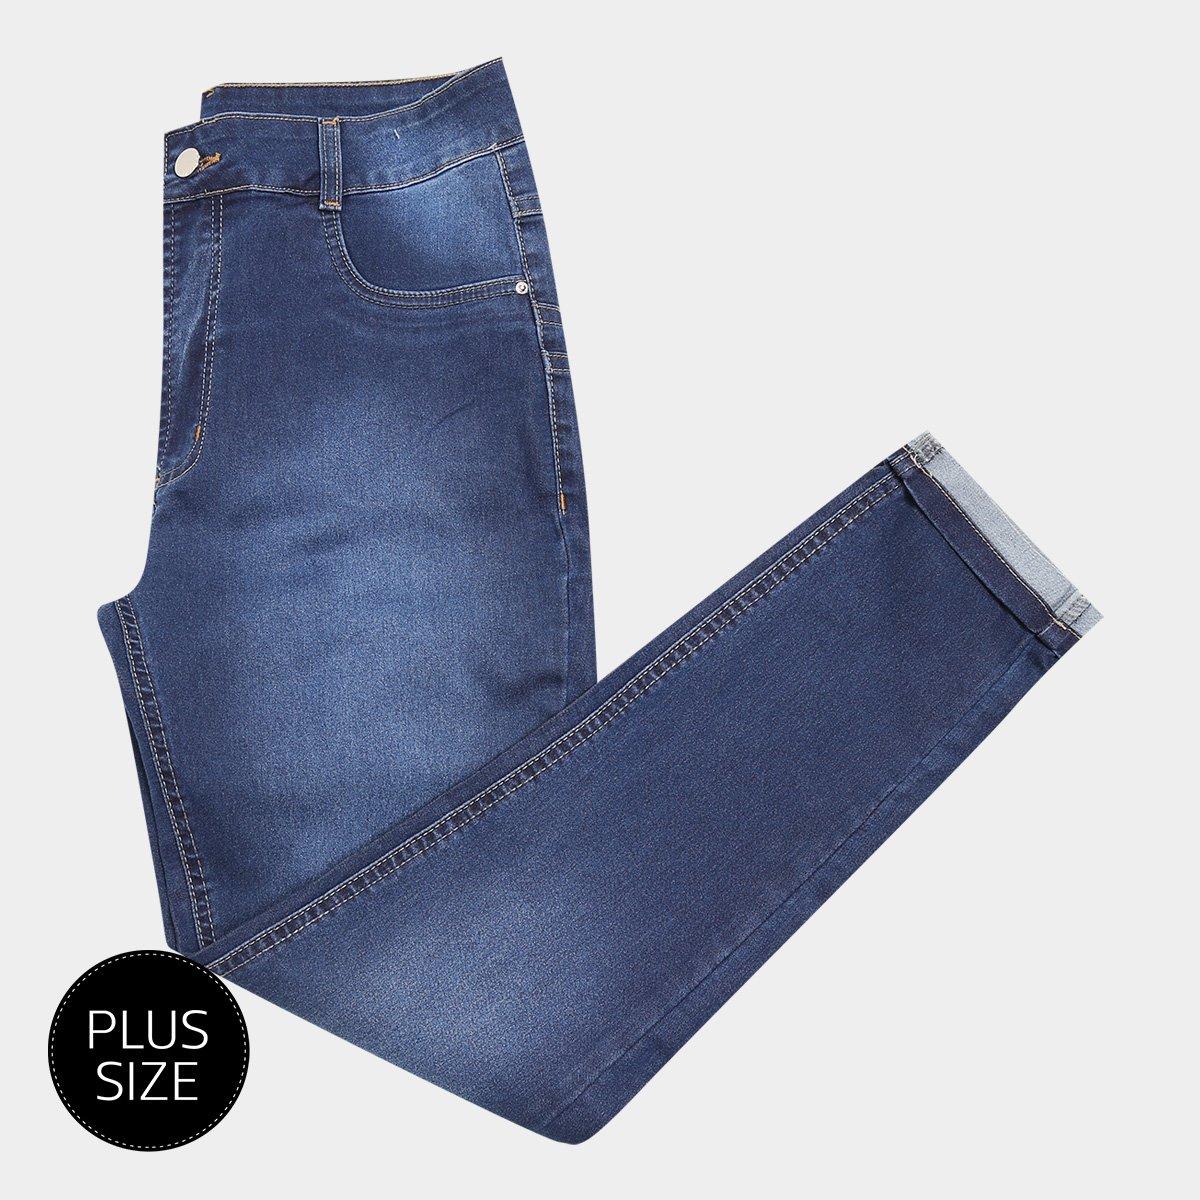 ffd876f67 Calça Jeans Skinny Sawary Estonada Cintura Alta Plus Size Feminina |  Netshoes